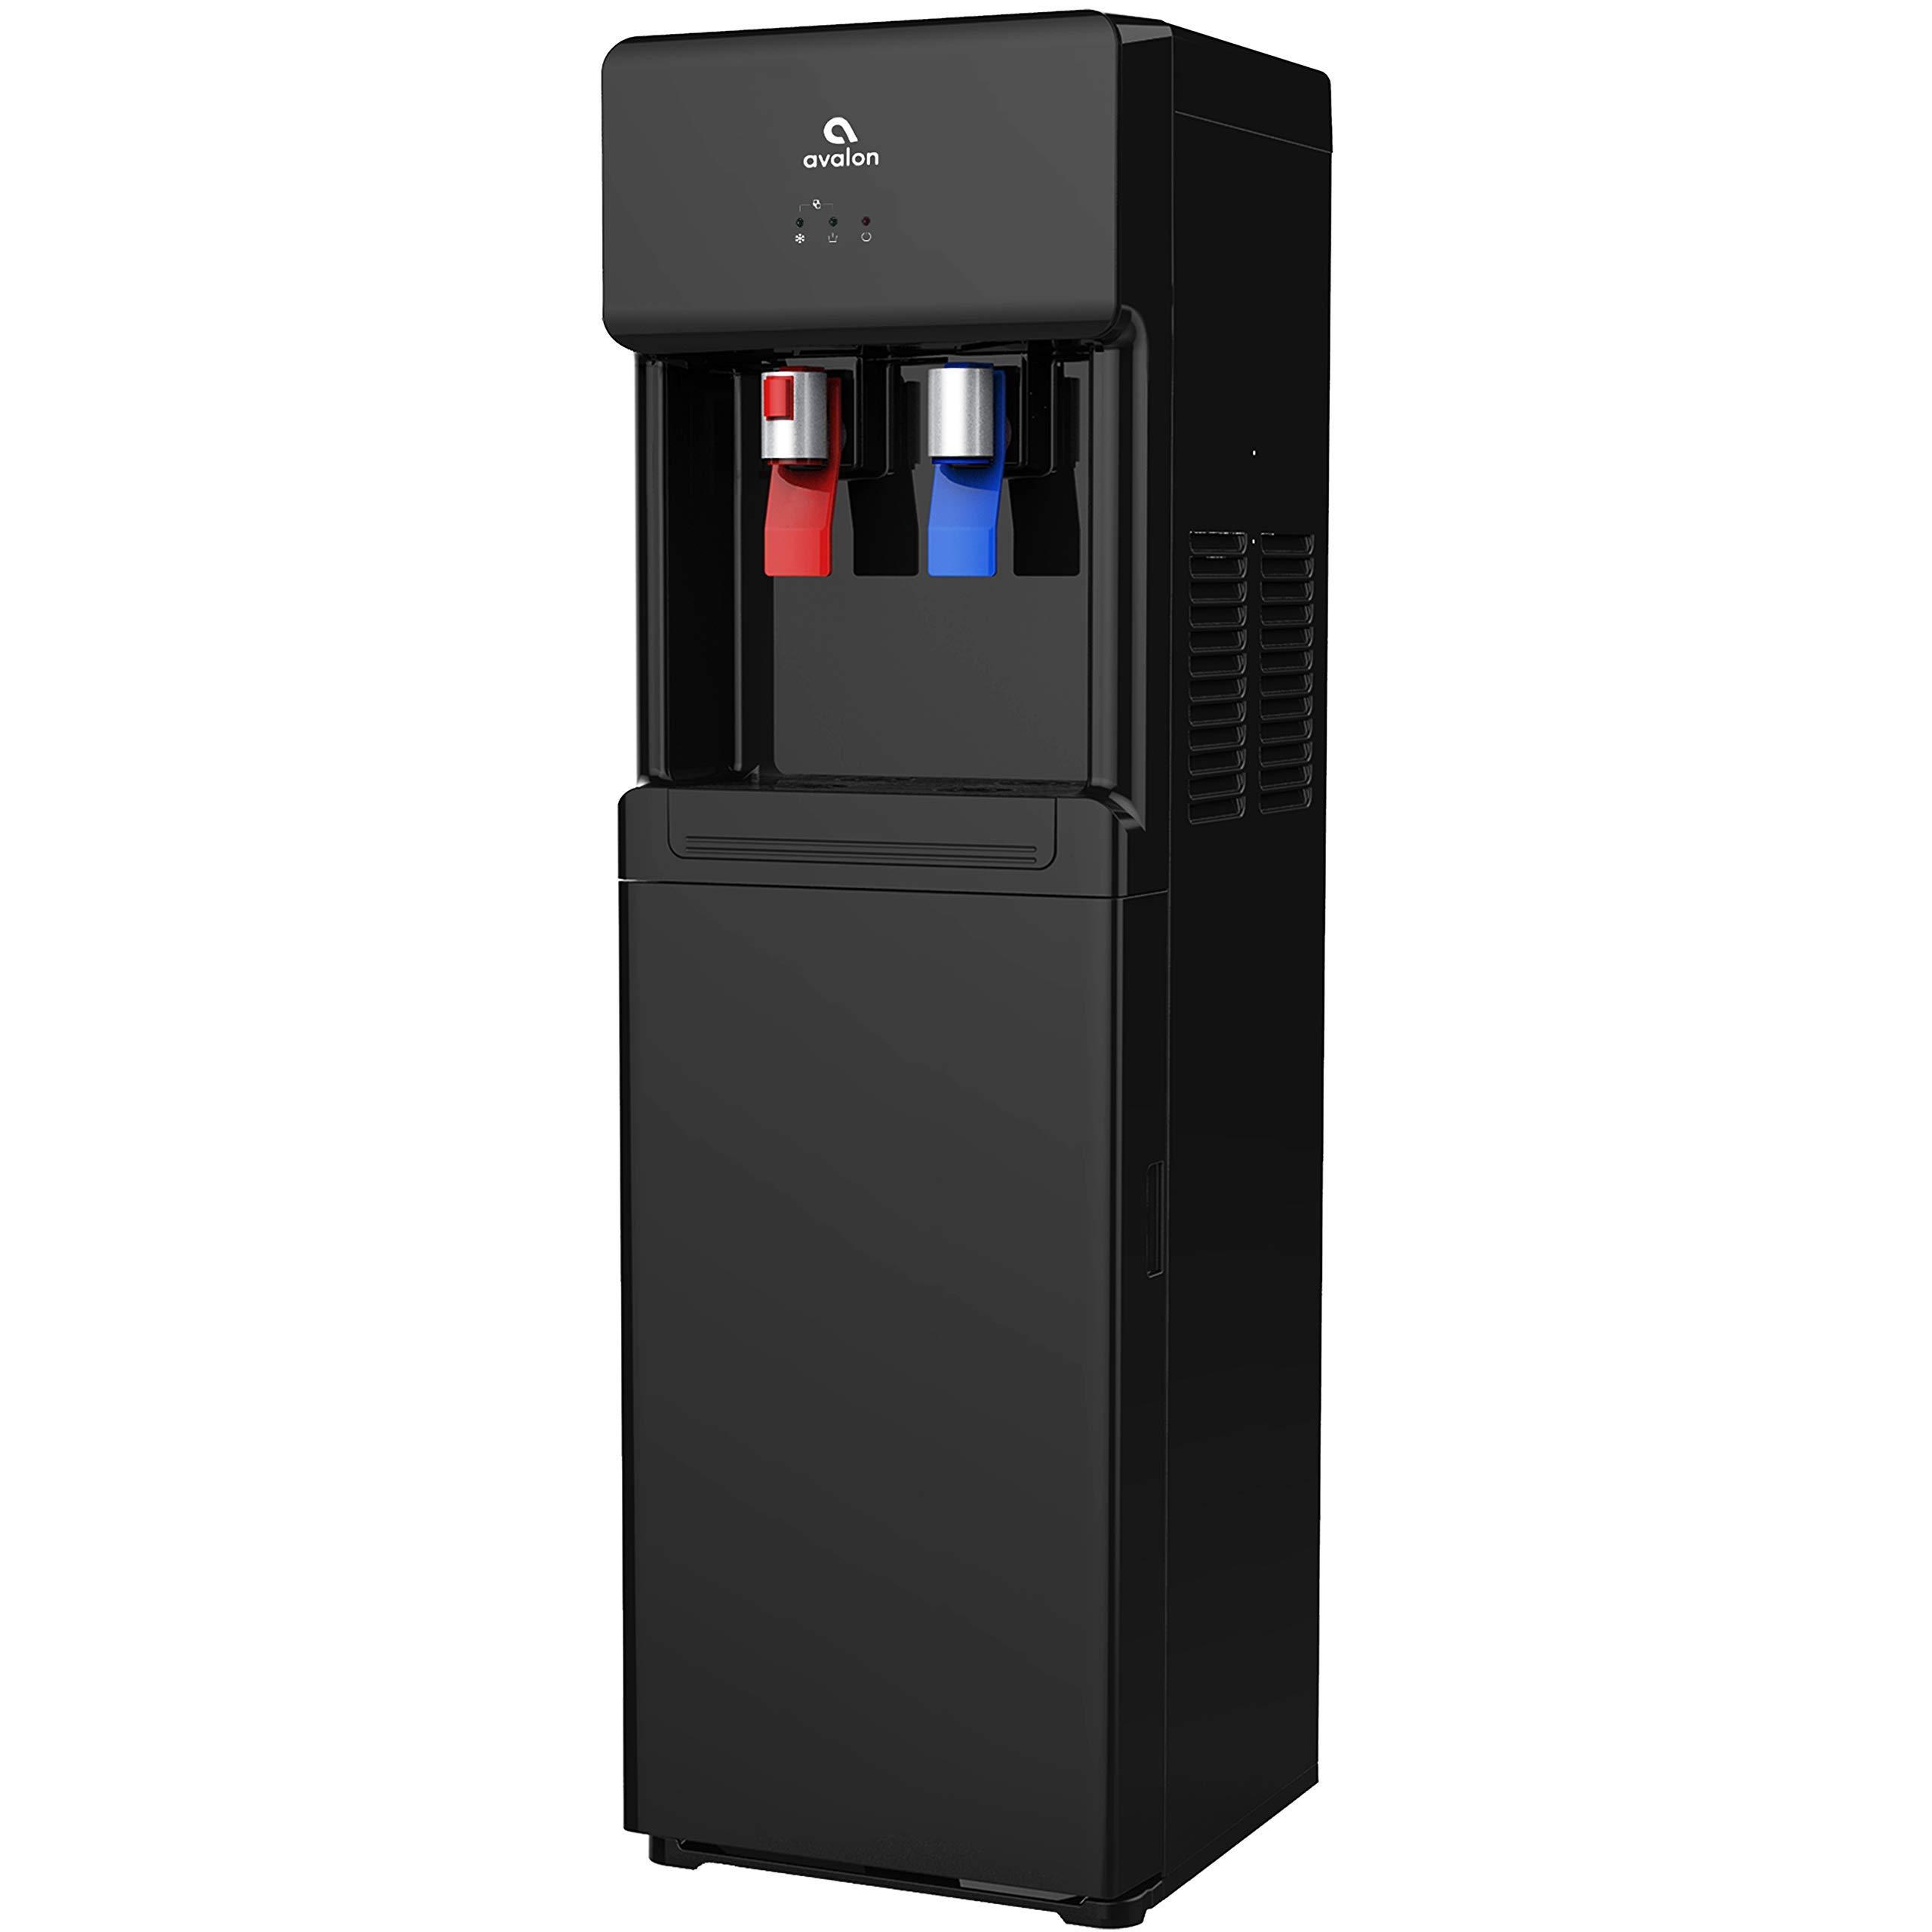 Avalon A6BLK A6 Bottom Loading Cooler Dispenser-Hot & Cold Water, Child Safety Lock, Innovative Slim Design (Black), free standing, (Renewed) by Avalon